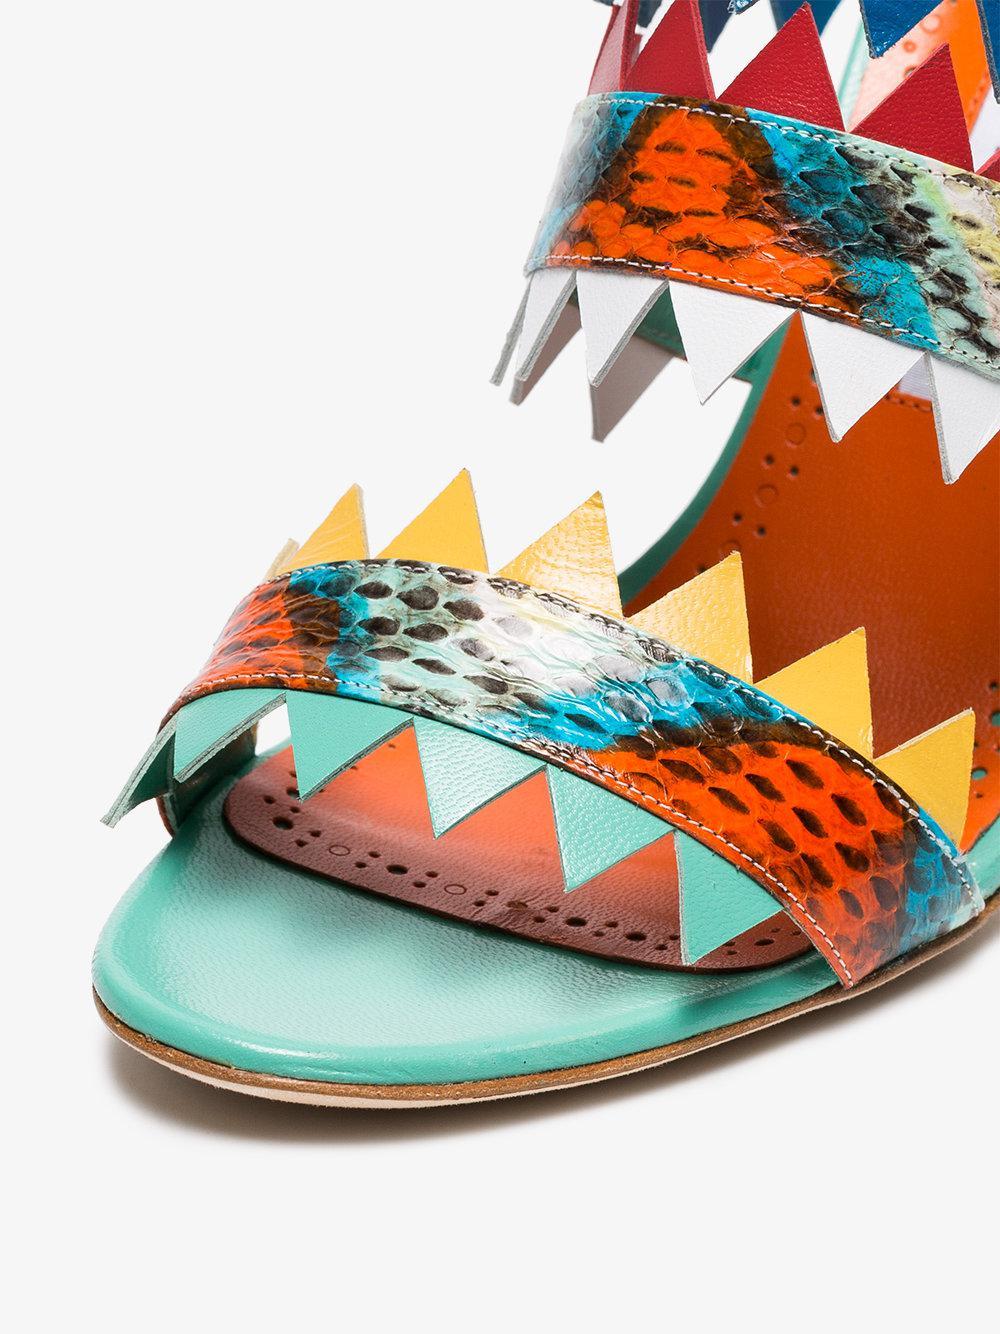 971f2ad7097 Lyst - Manolo Blahnik Multi Coloured Arpege 105 Snakeskin Sandals in ...